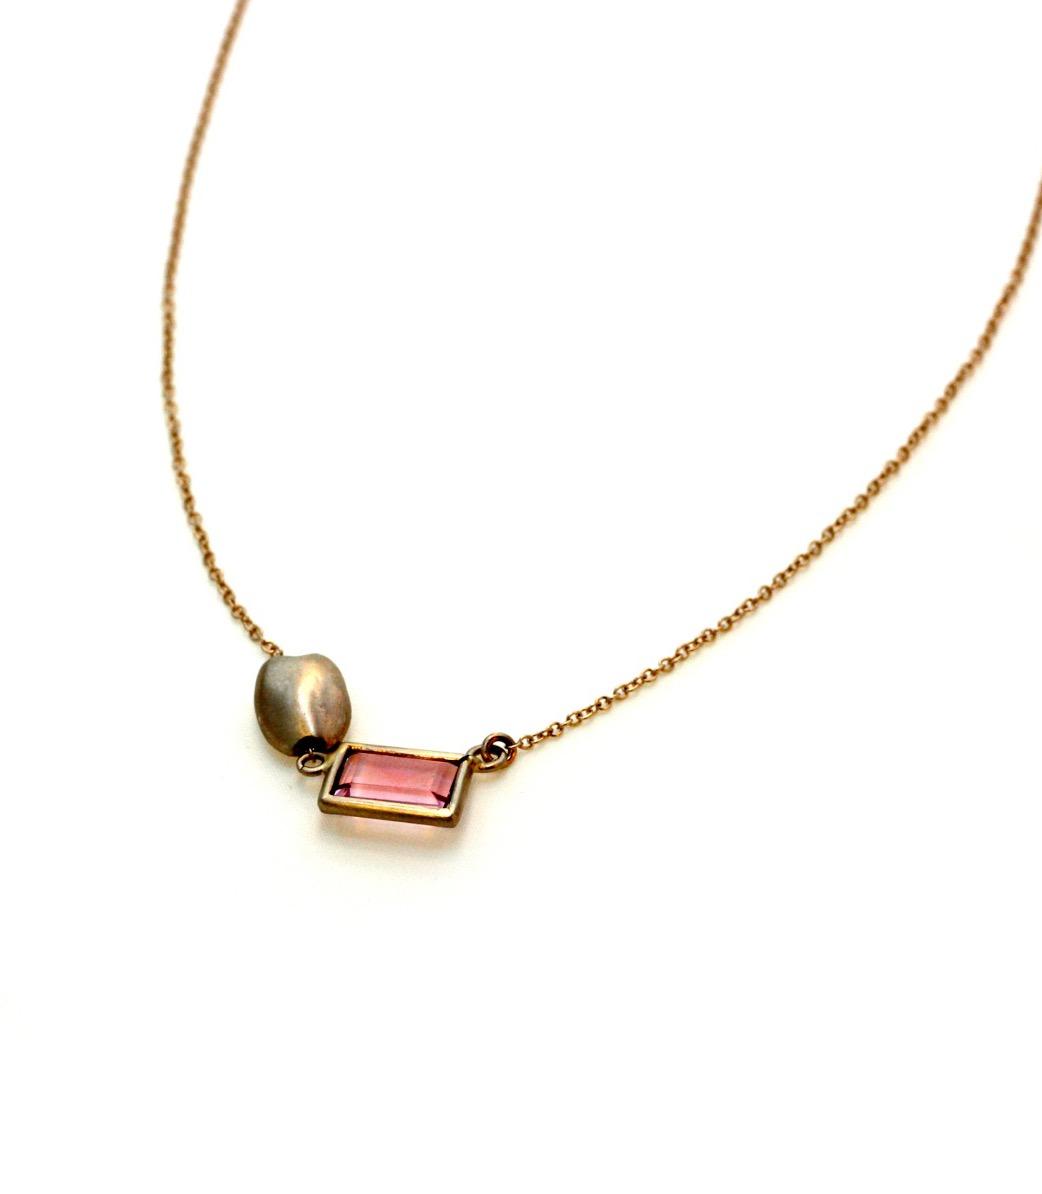 Carrob seed necklace pink tourmaline